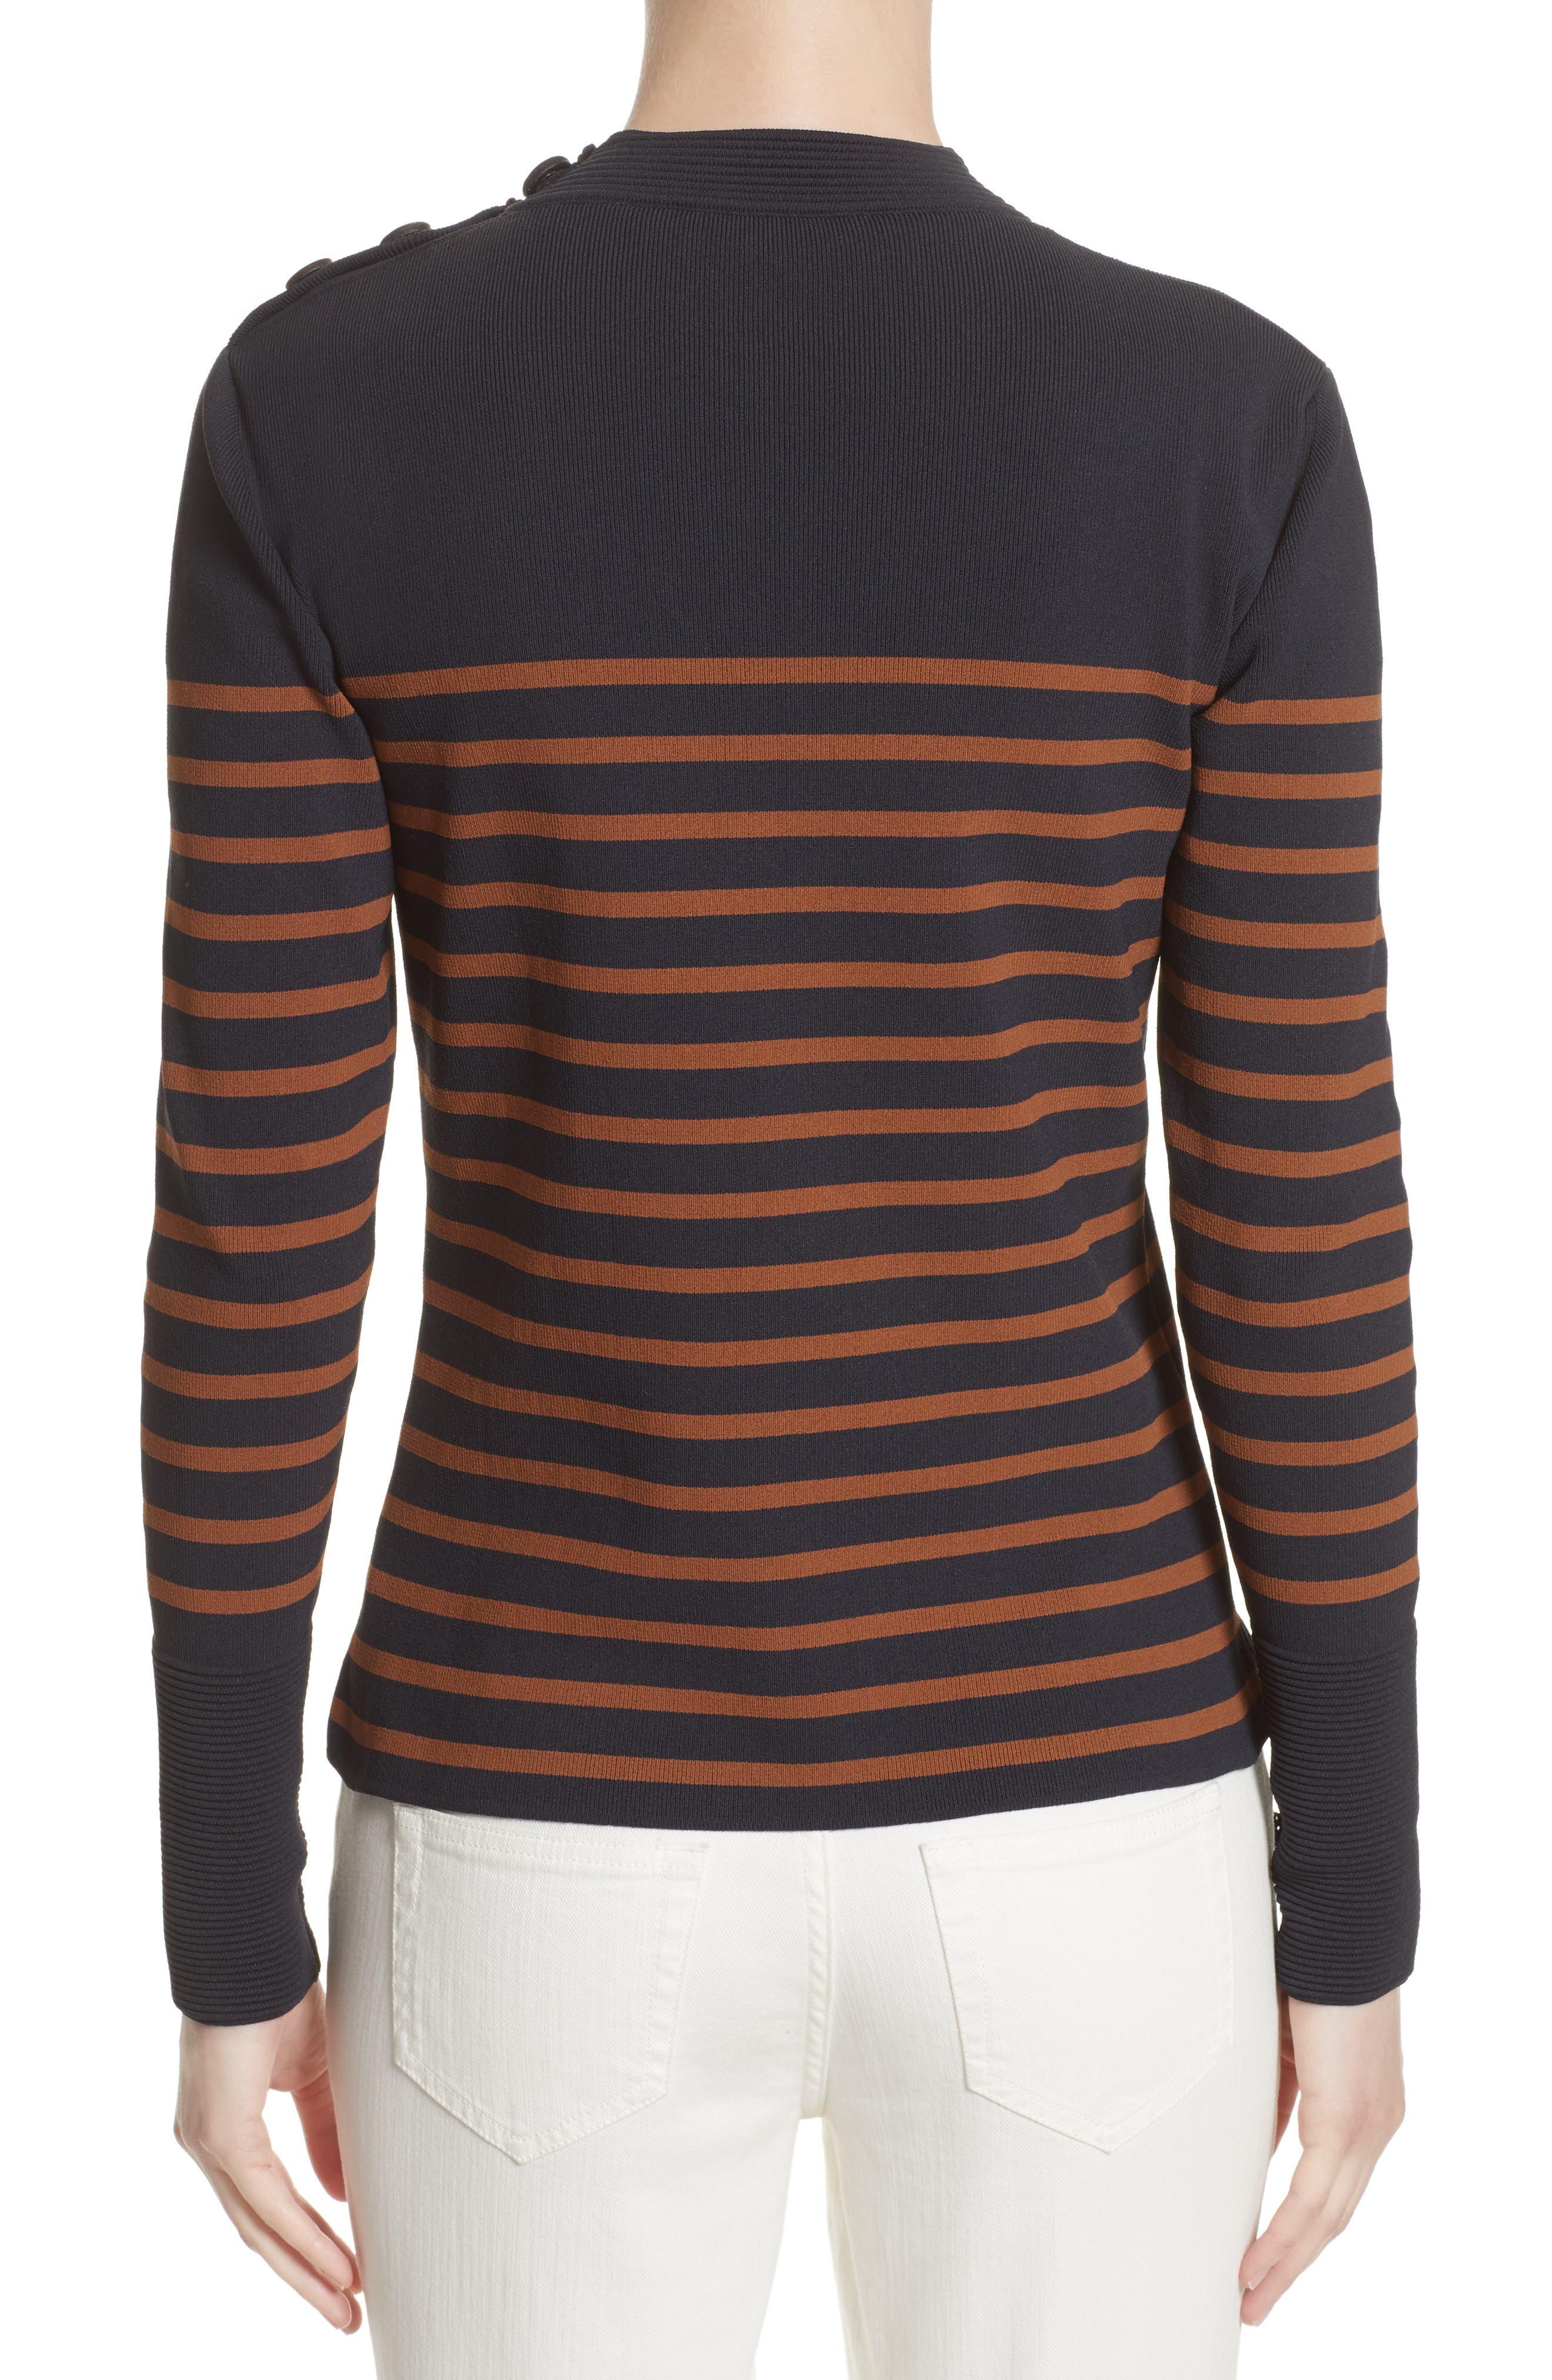 Selicia Stripe Sweater,                             Alternate thumbnail 2, color,                             977